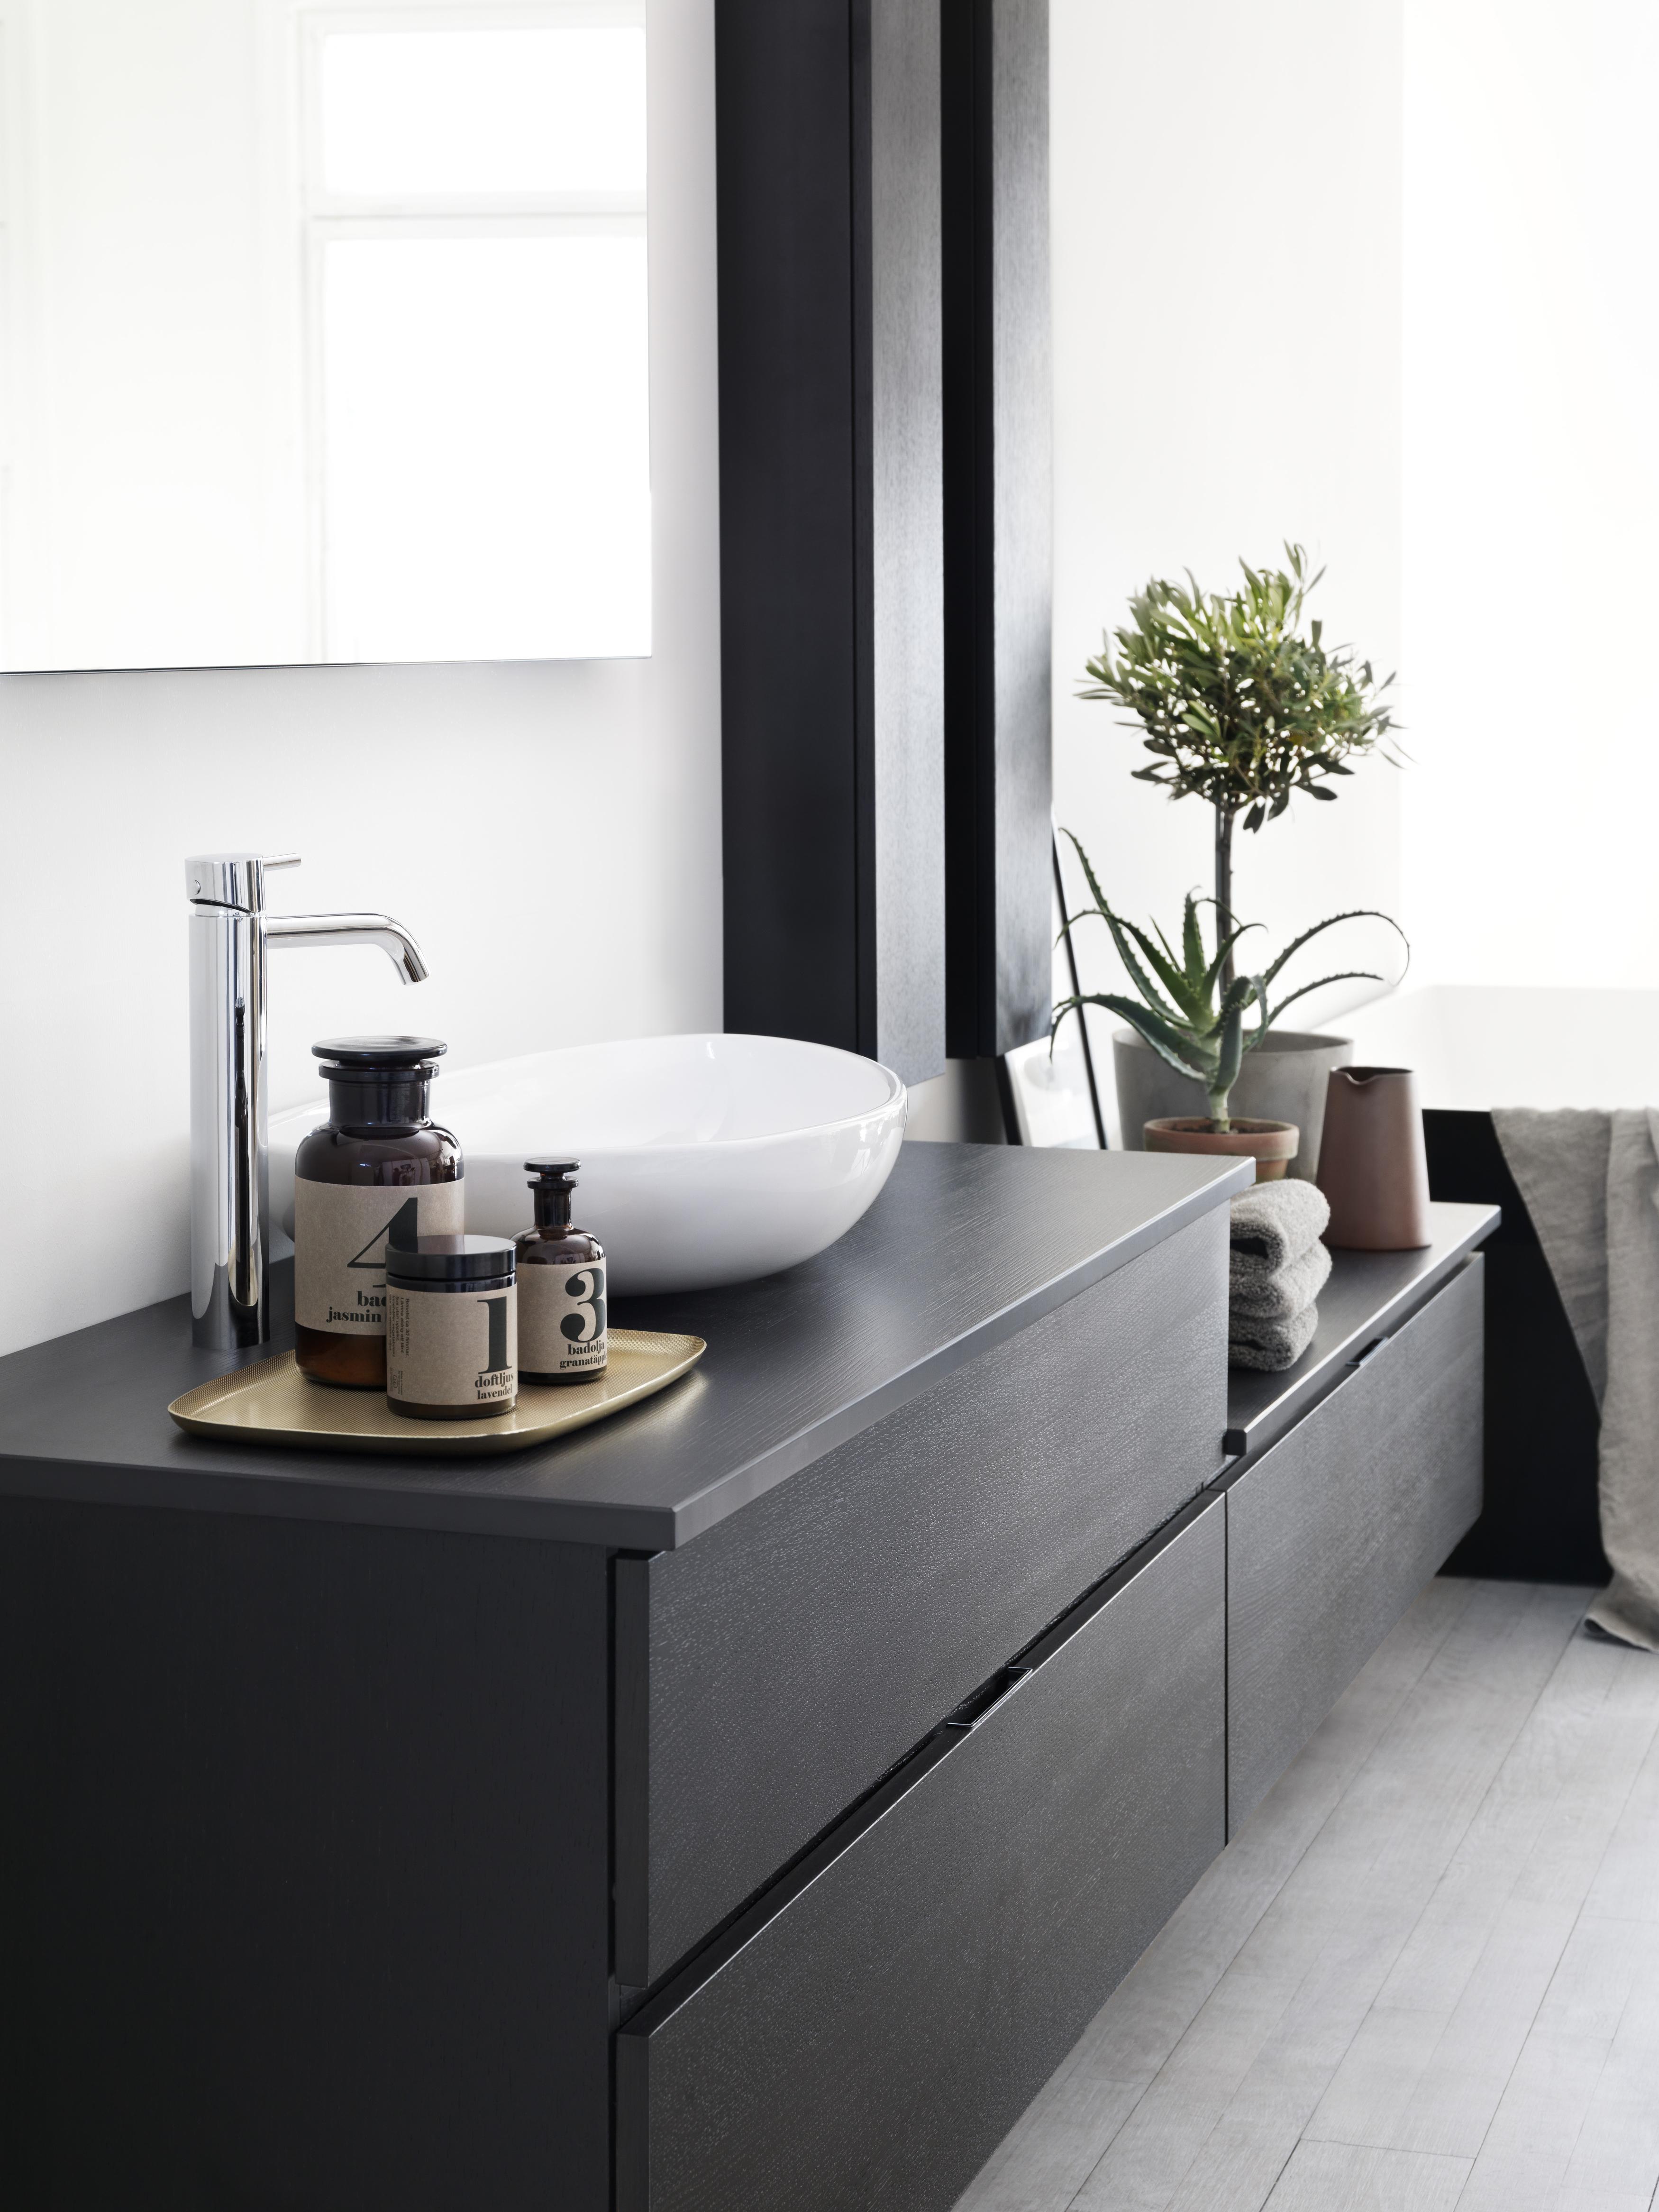 cosentino nederland | scandinavisch badkamerdesign met dekton, Badkamer